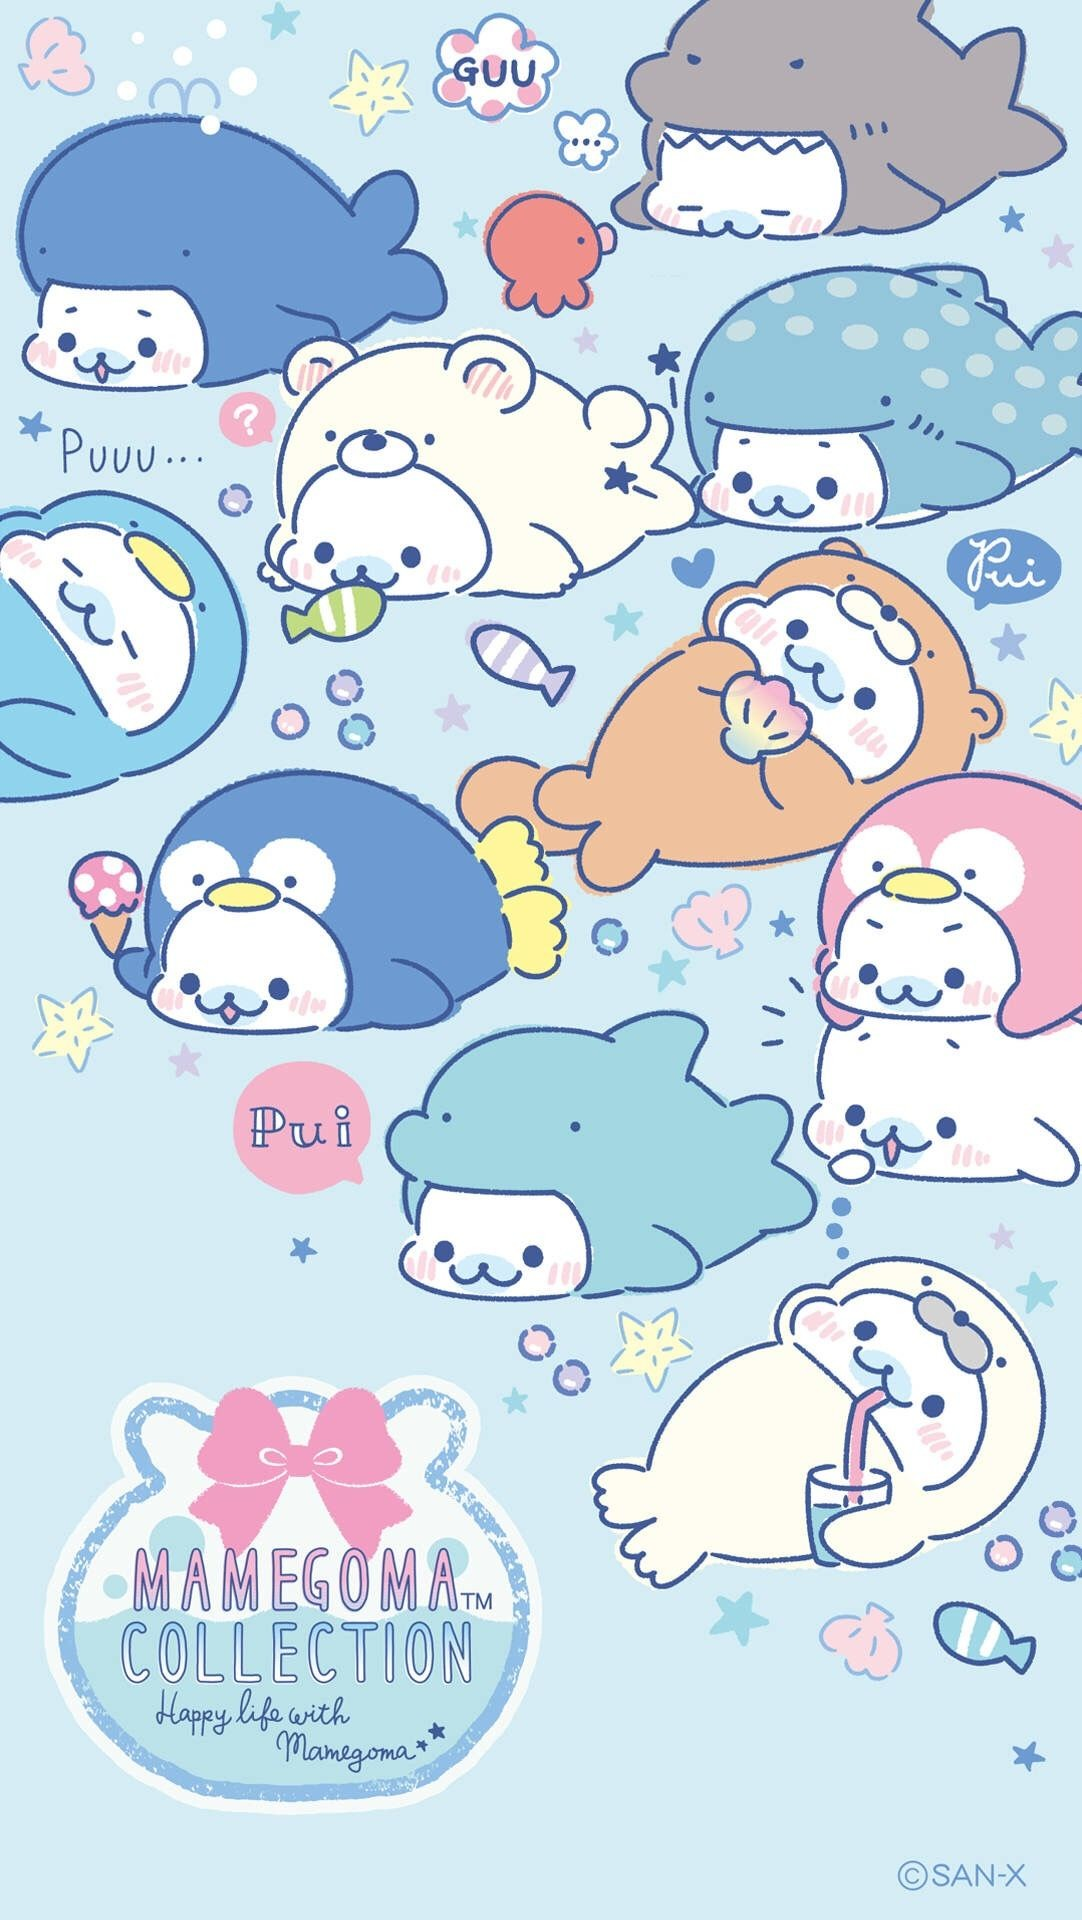 Kawaii Blue Wallpaper Posted By Sarah Simpson